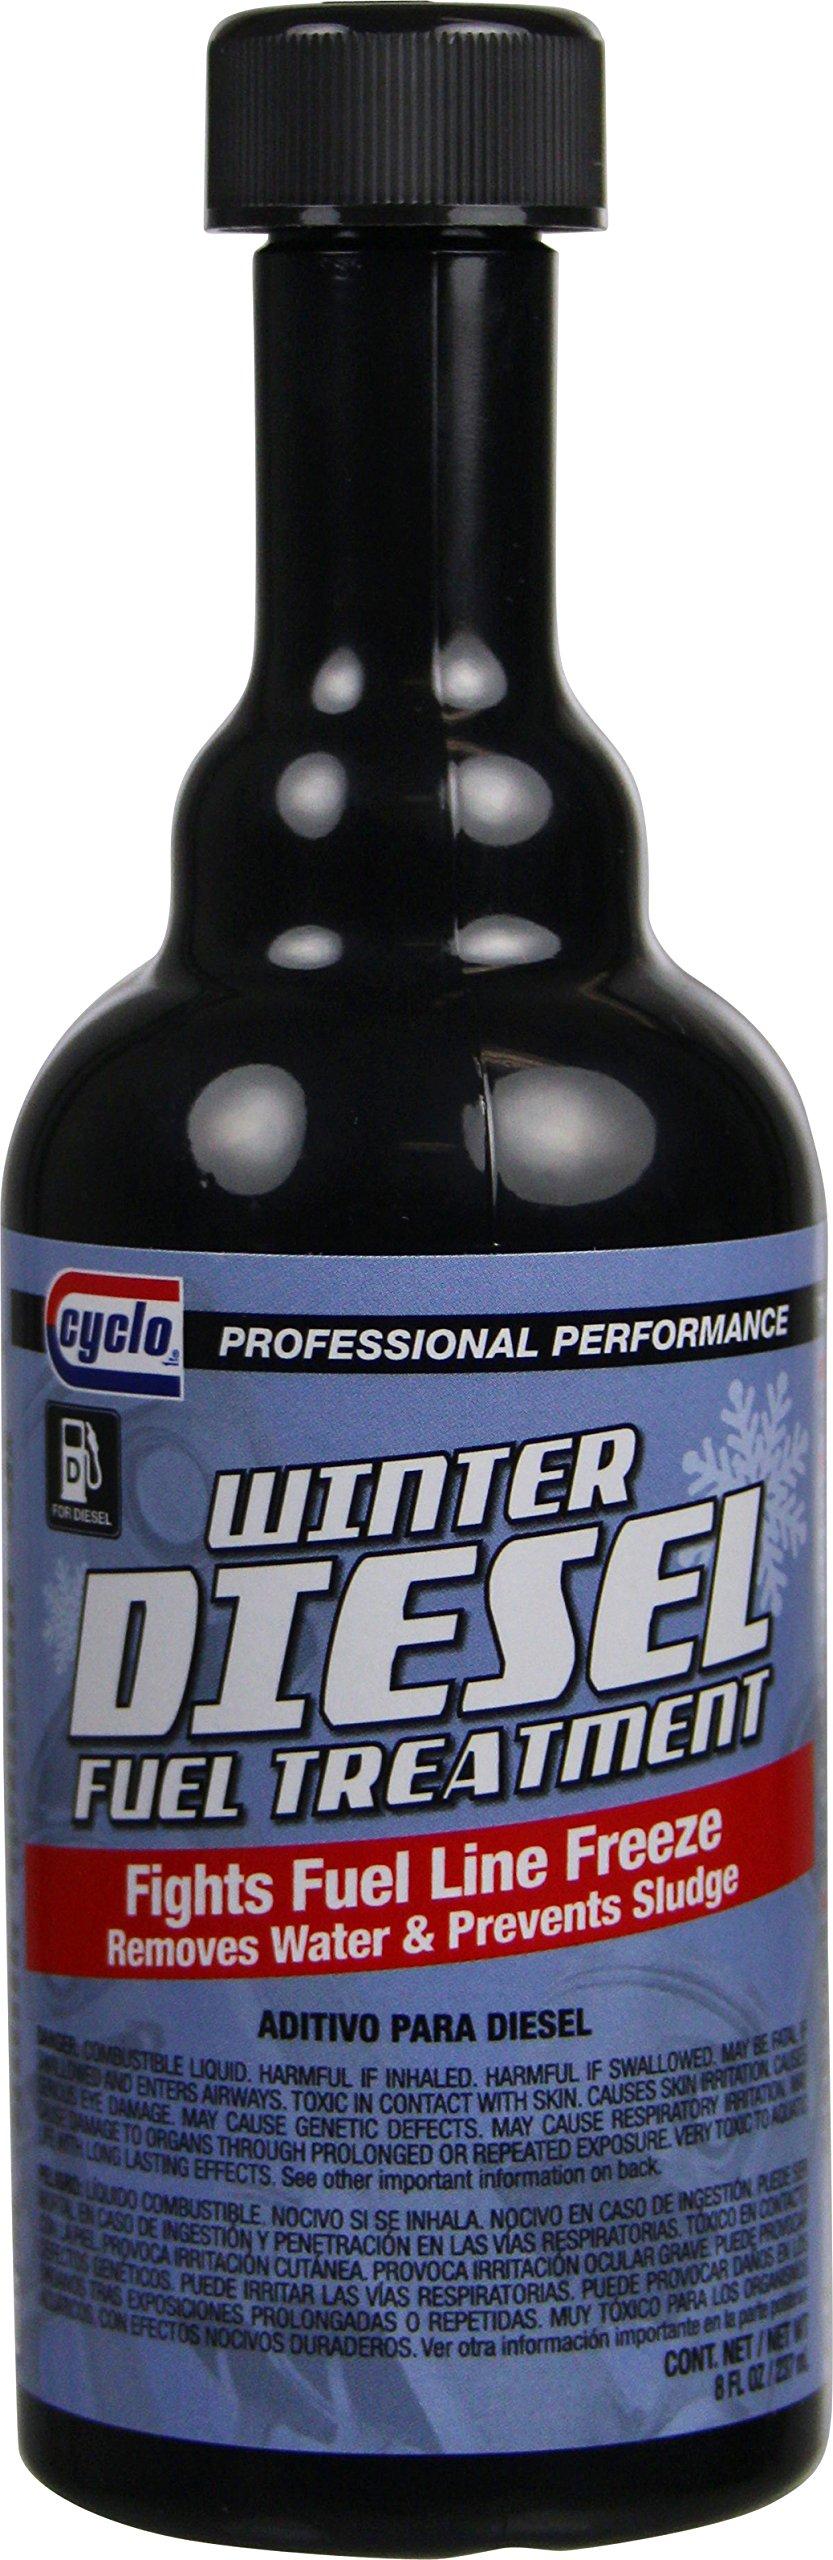 Niteo Cyclo C23 Diesel Anti Gel Fuel Treatment & Injector Cleaner, 8 fl oz, Case of 12